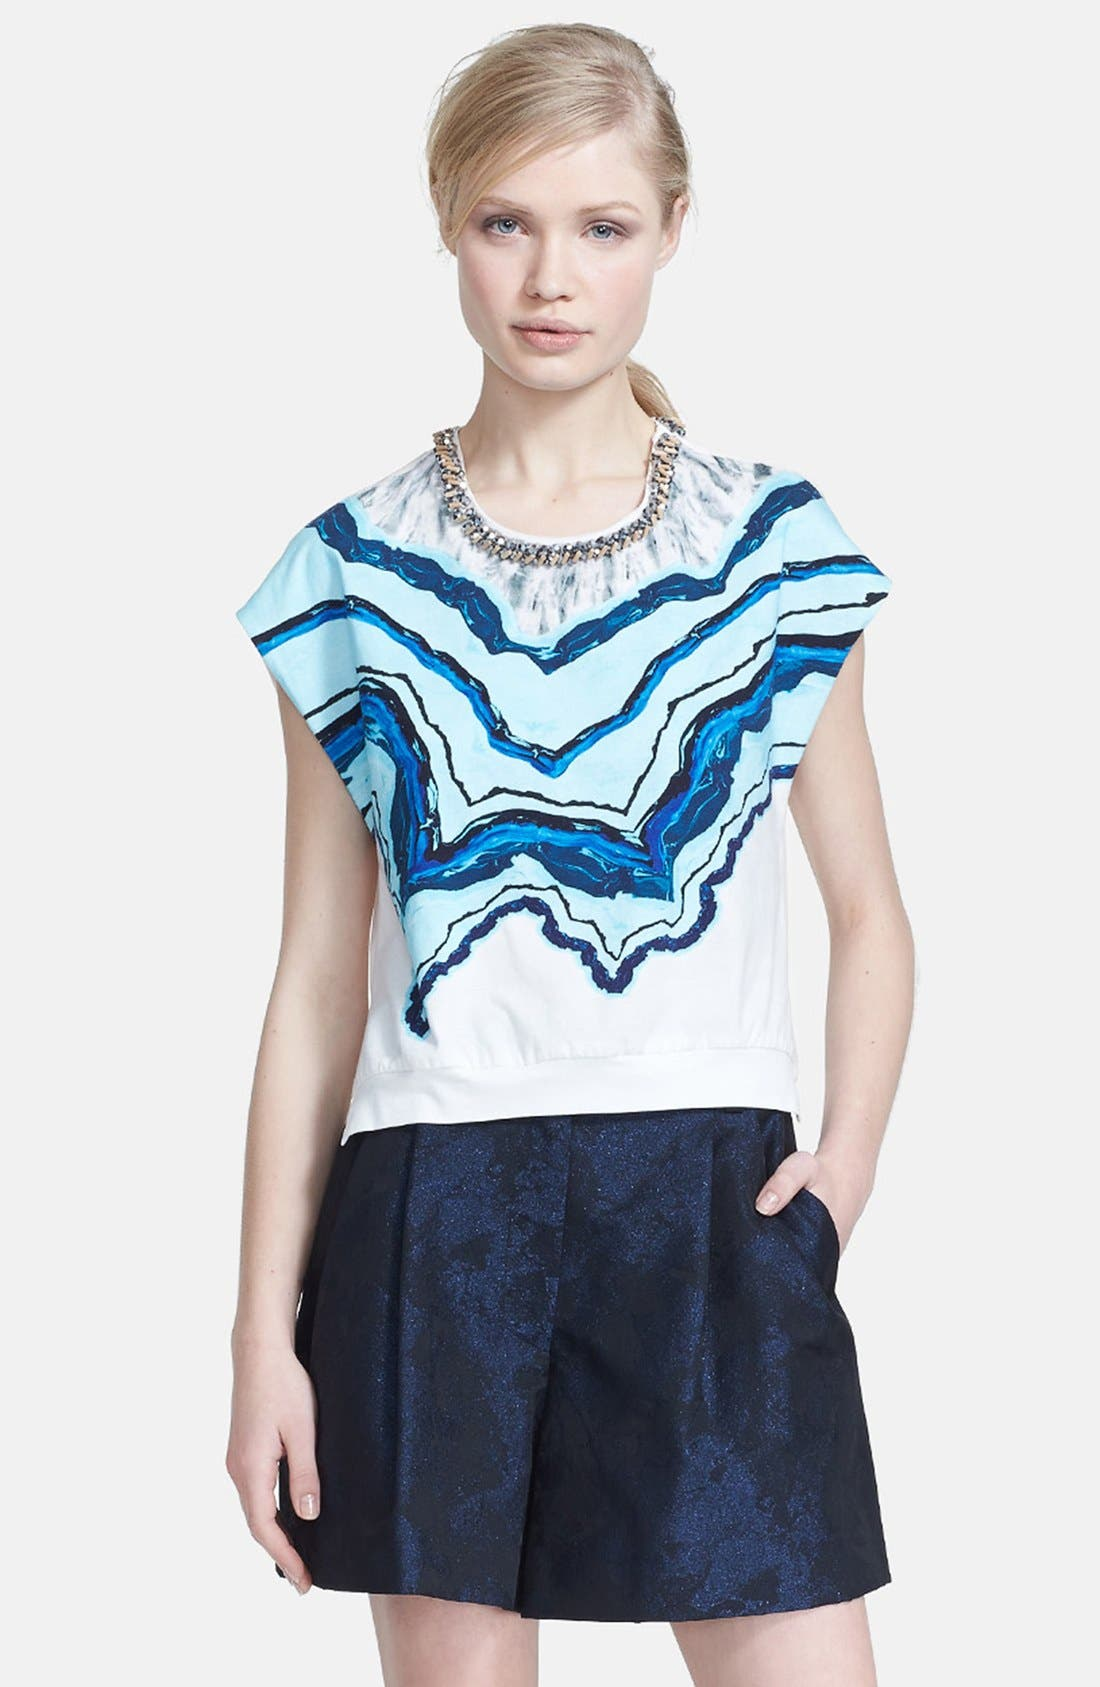 Main Image - 3.1 Phillip Lim Beaded Neck Print Cotton Top